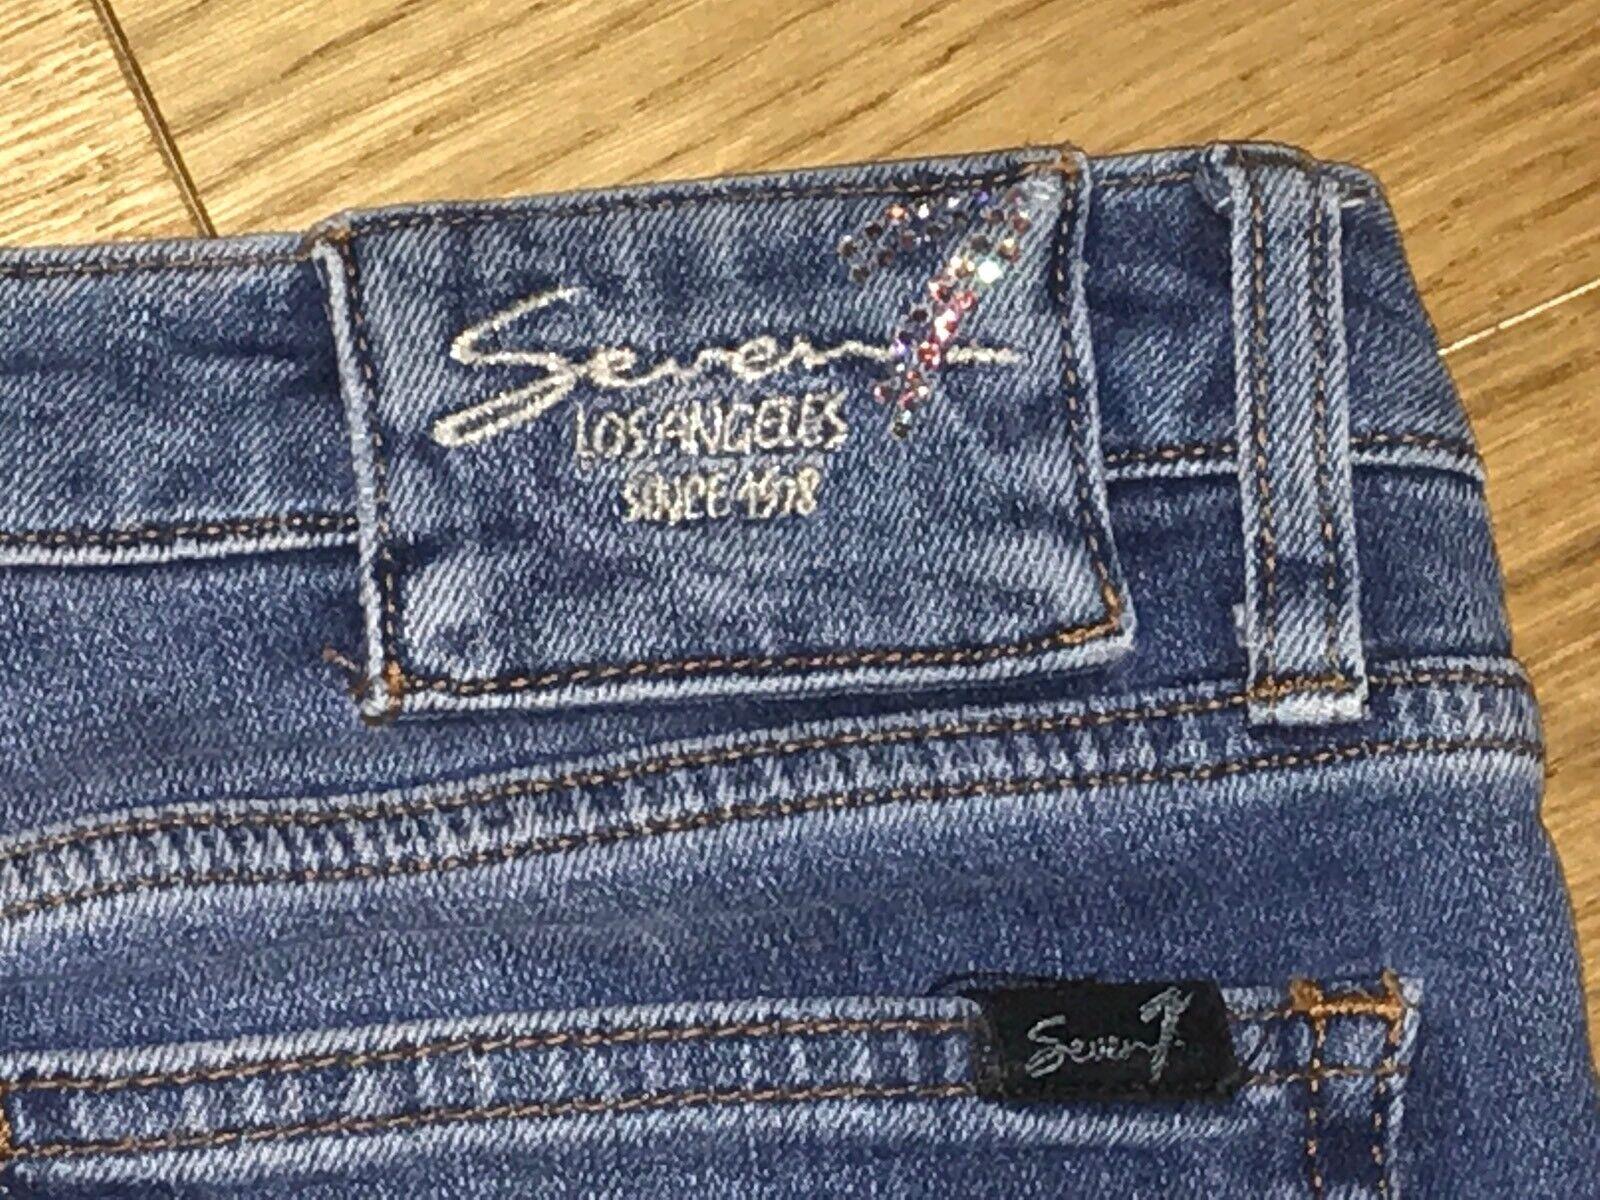 Seven for all mankindsuper mankindsuper mankindsuper Damen Jeans mit GlitzerapplikationenGr.34blau | Fierce Kaufen  8901c9